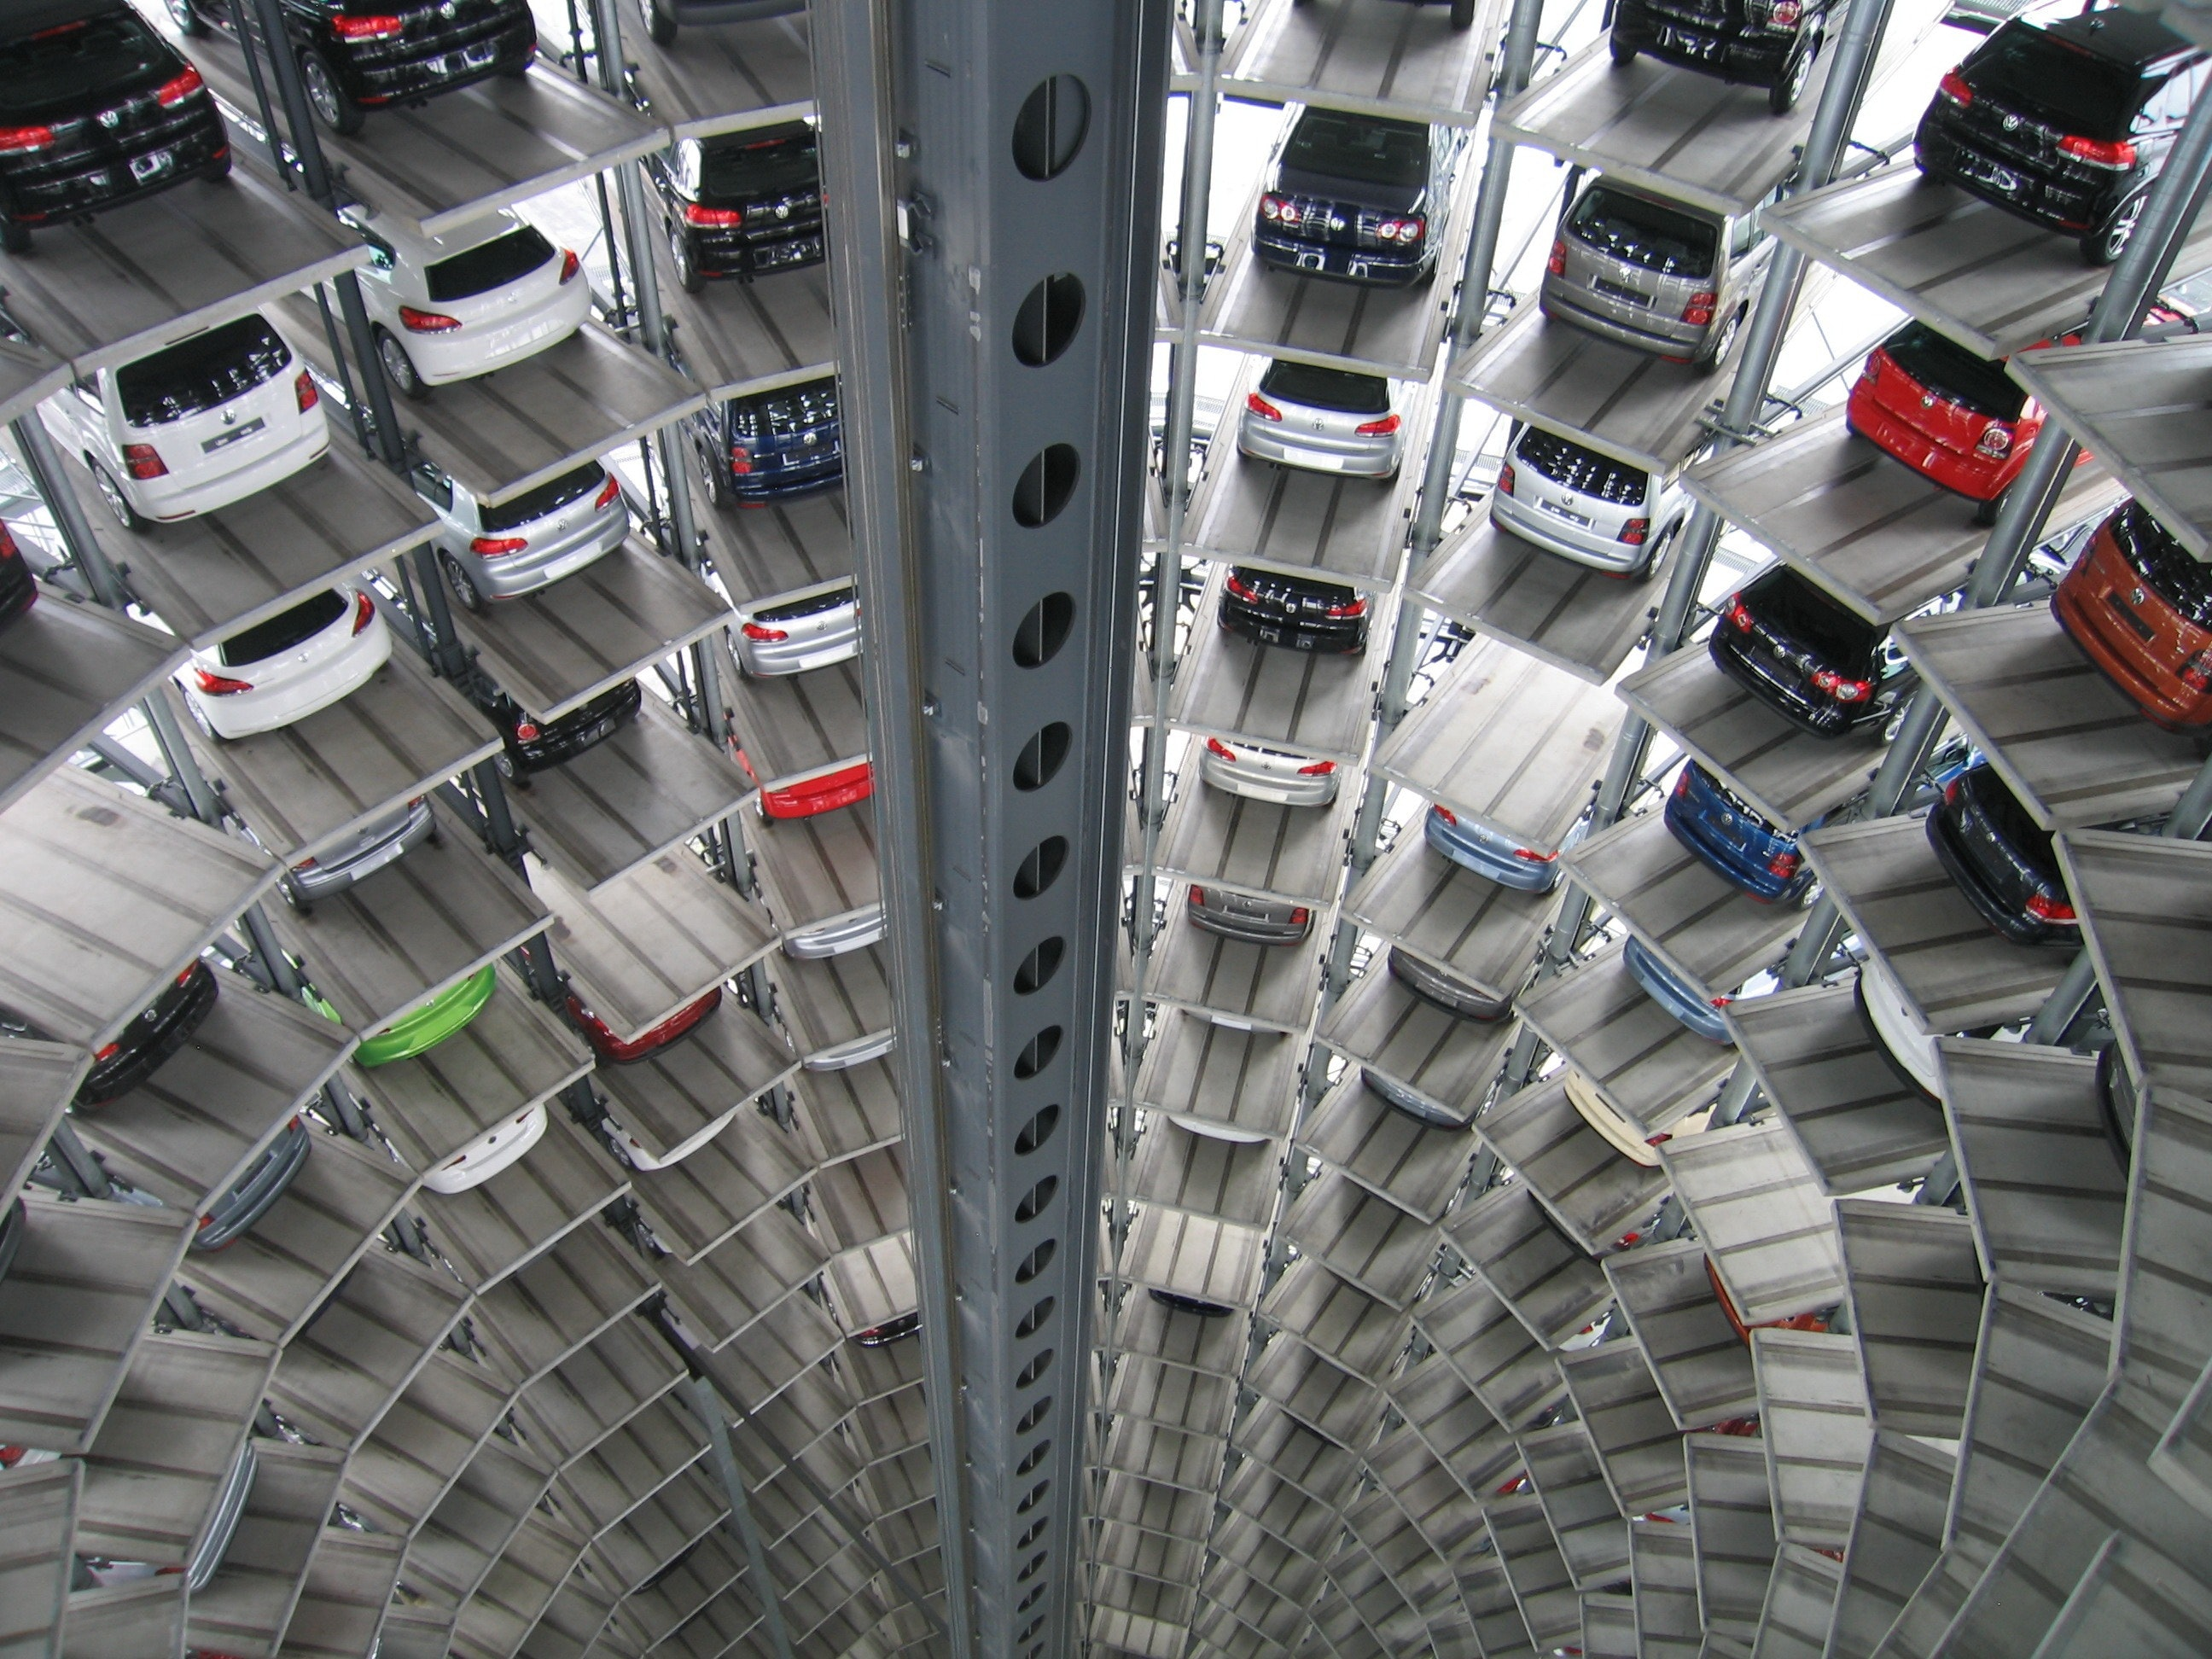 Car images · Pexels · Free Stock s